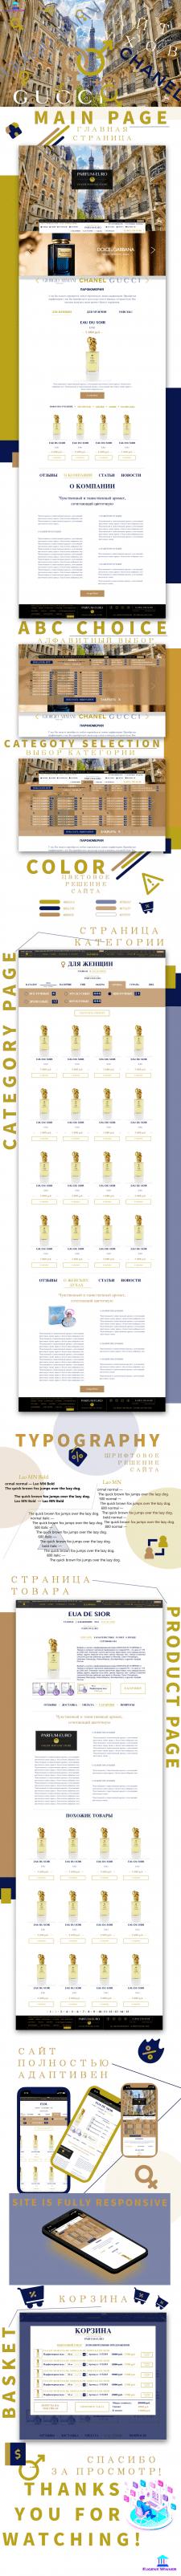 Интернет магазин духов - сайт под ключ